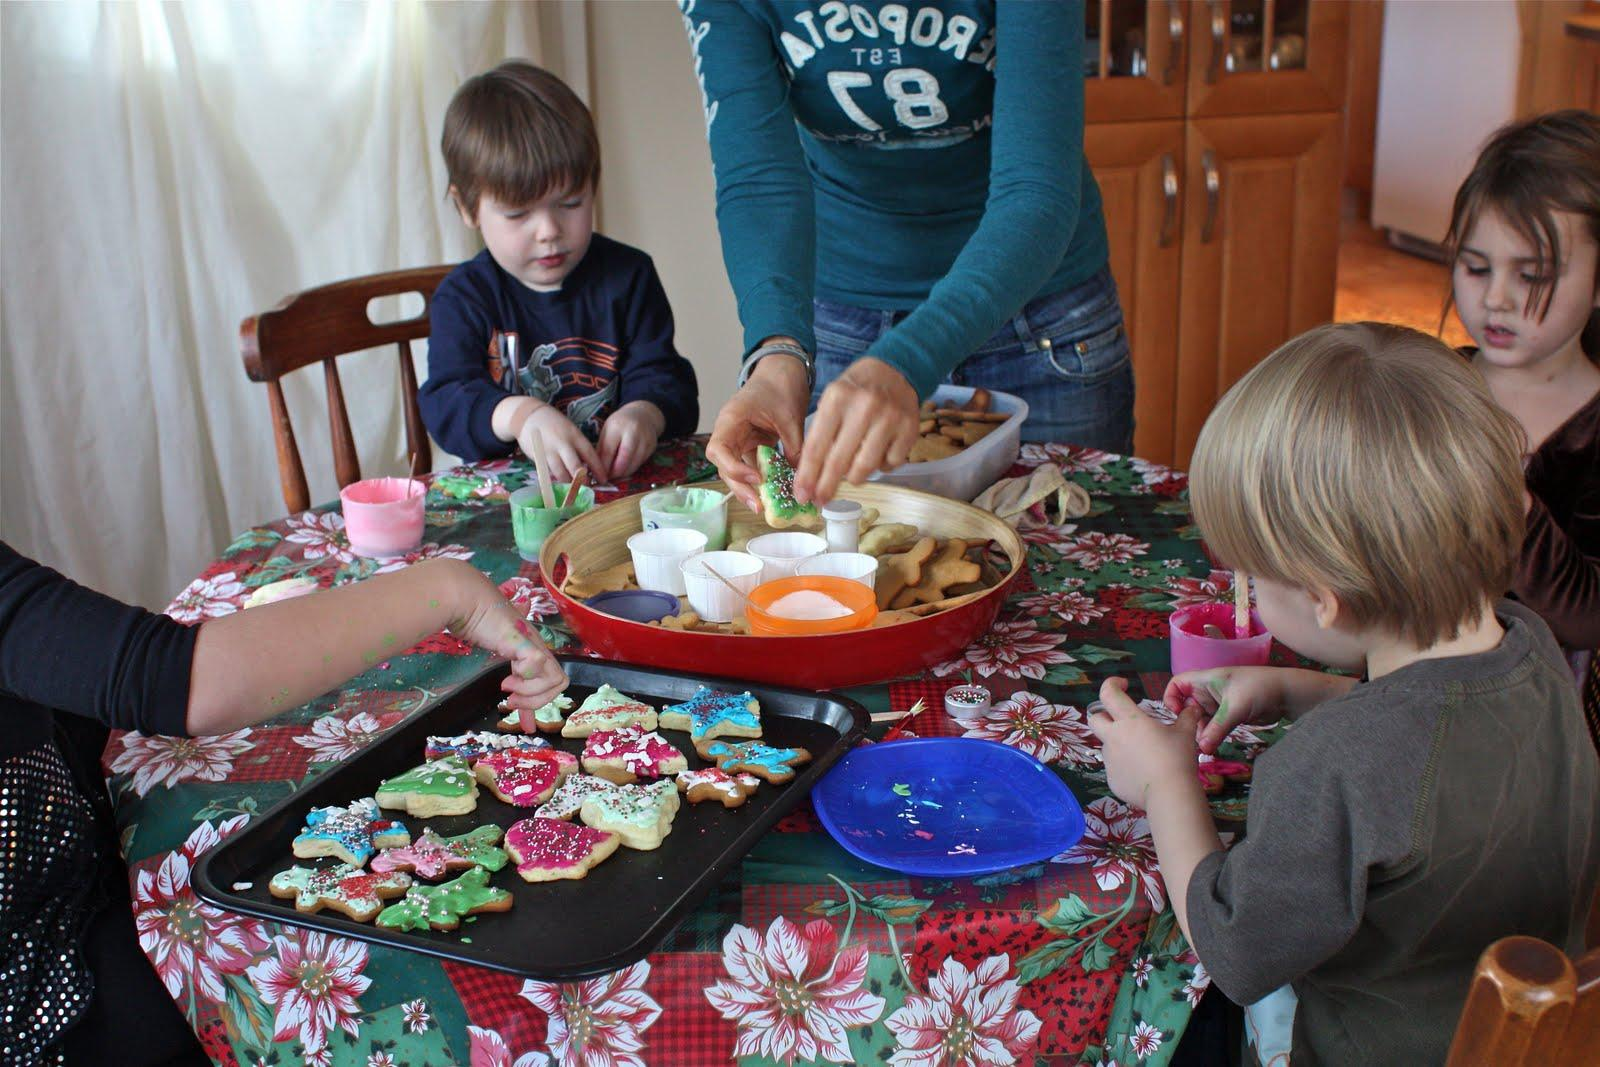 around flinging ornaments,